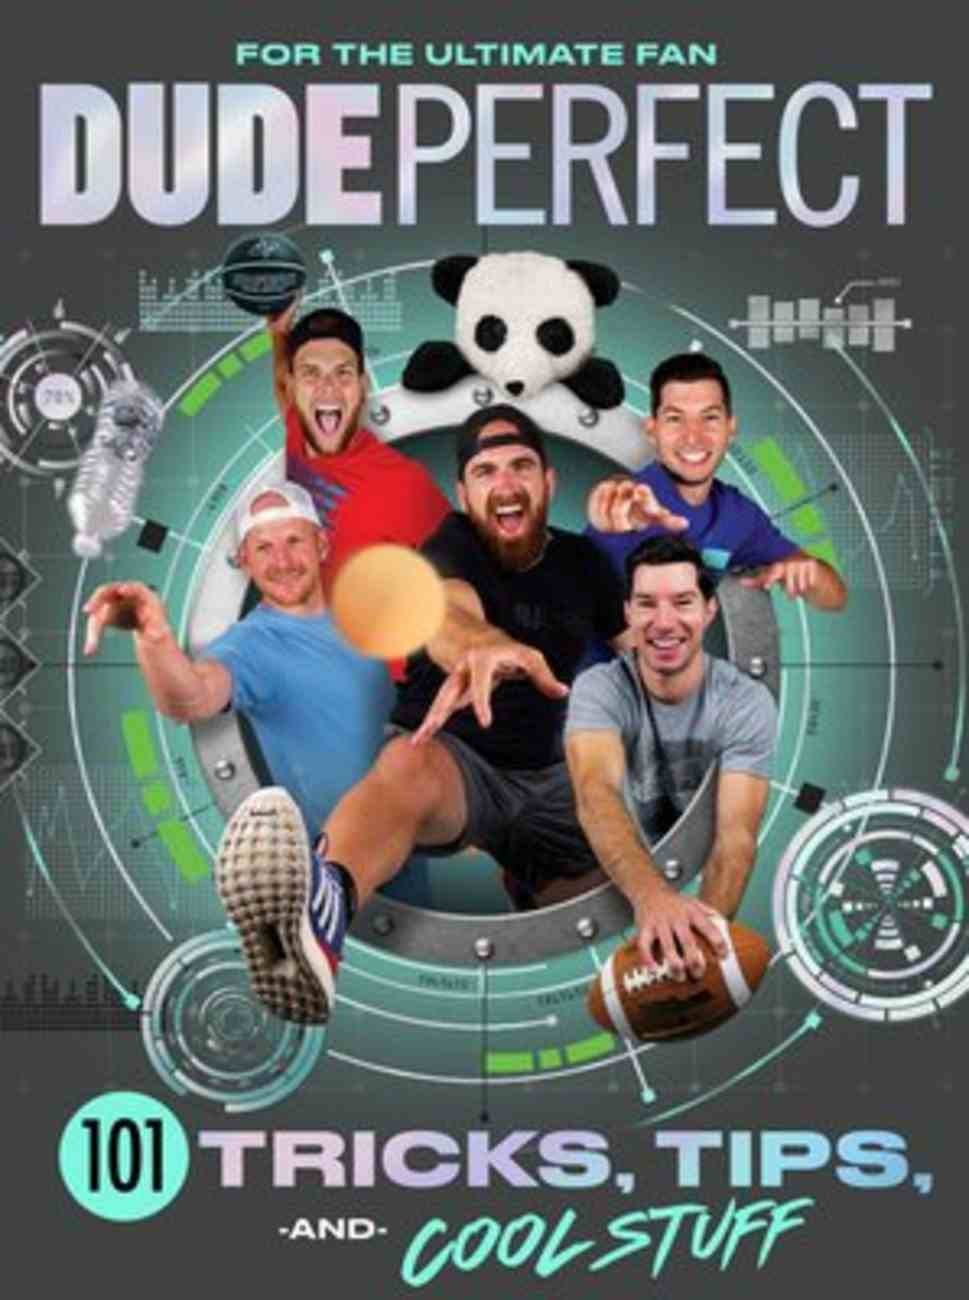 Dude Perfect 101 Tricks, Tips, and Cool Stuff Hardback